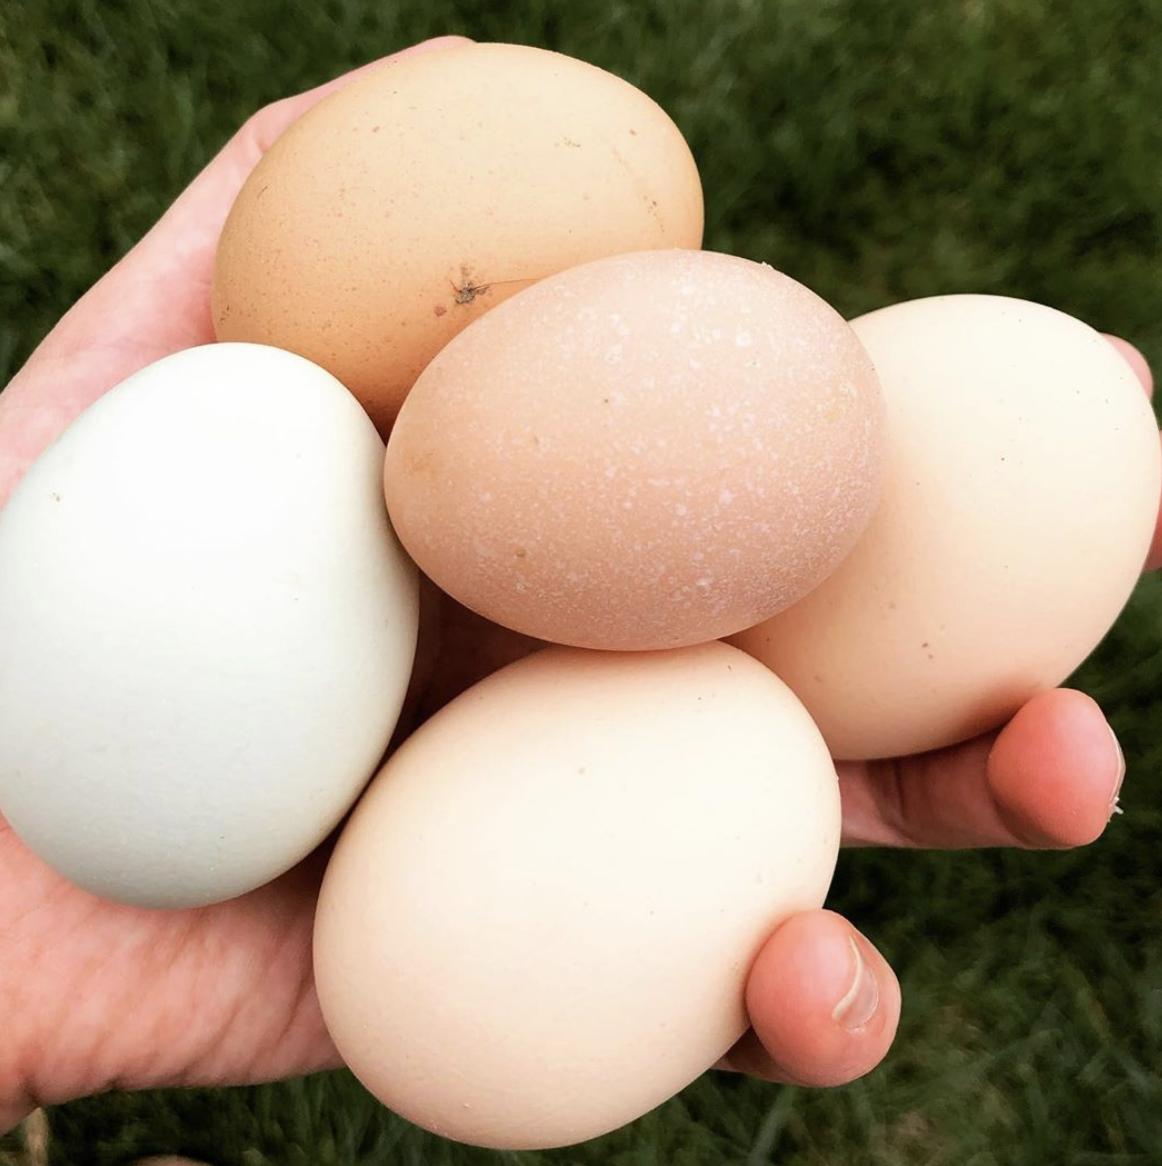 fresh eggs at sycamore hollow farm in Virginia